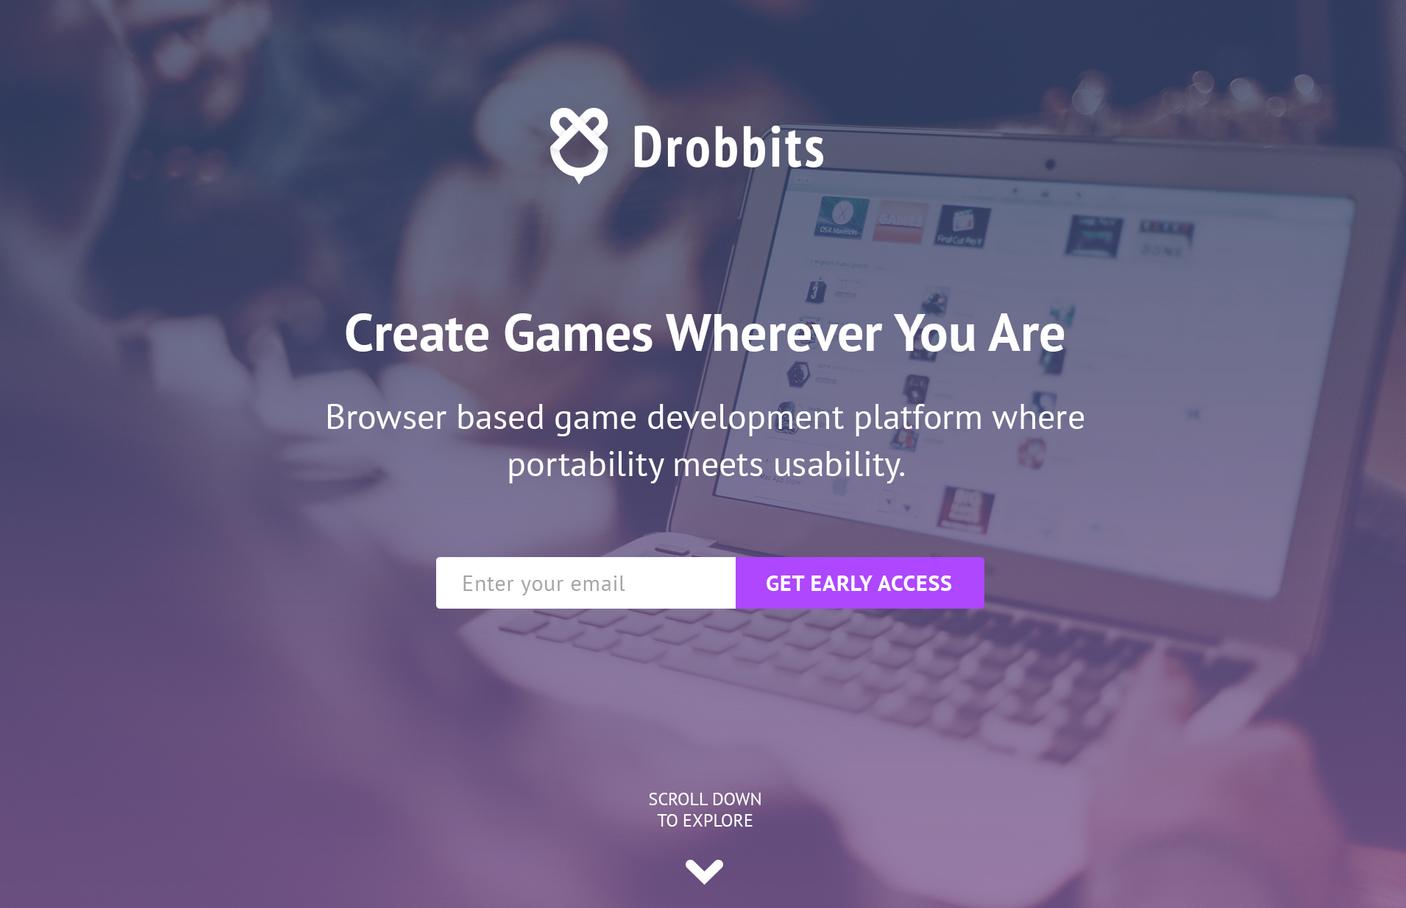 WRFX Drobbits 02